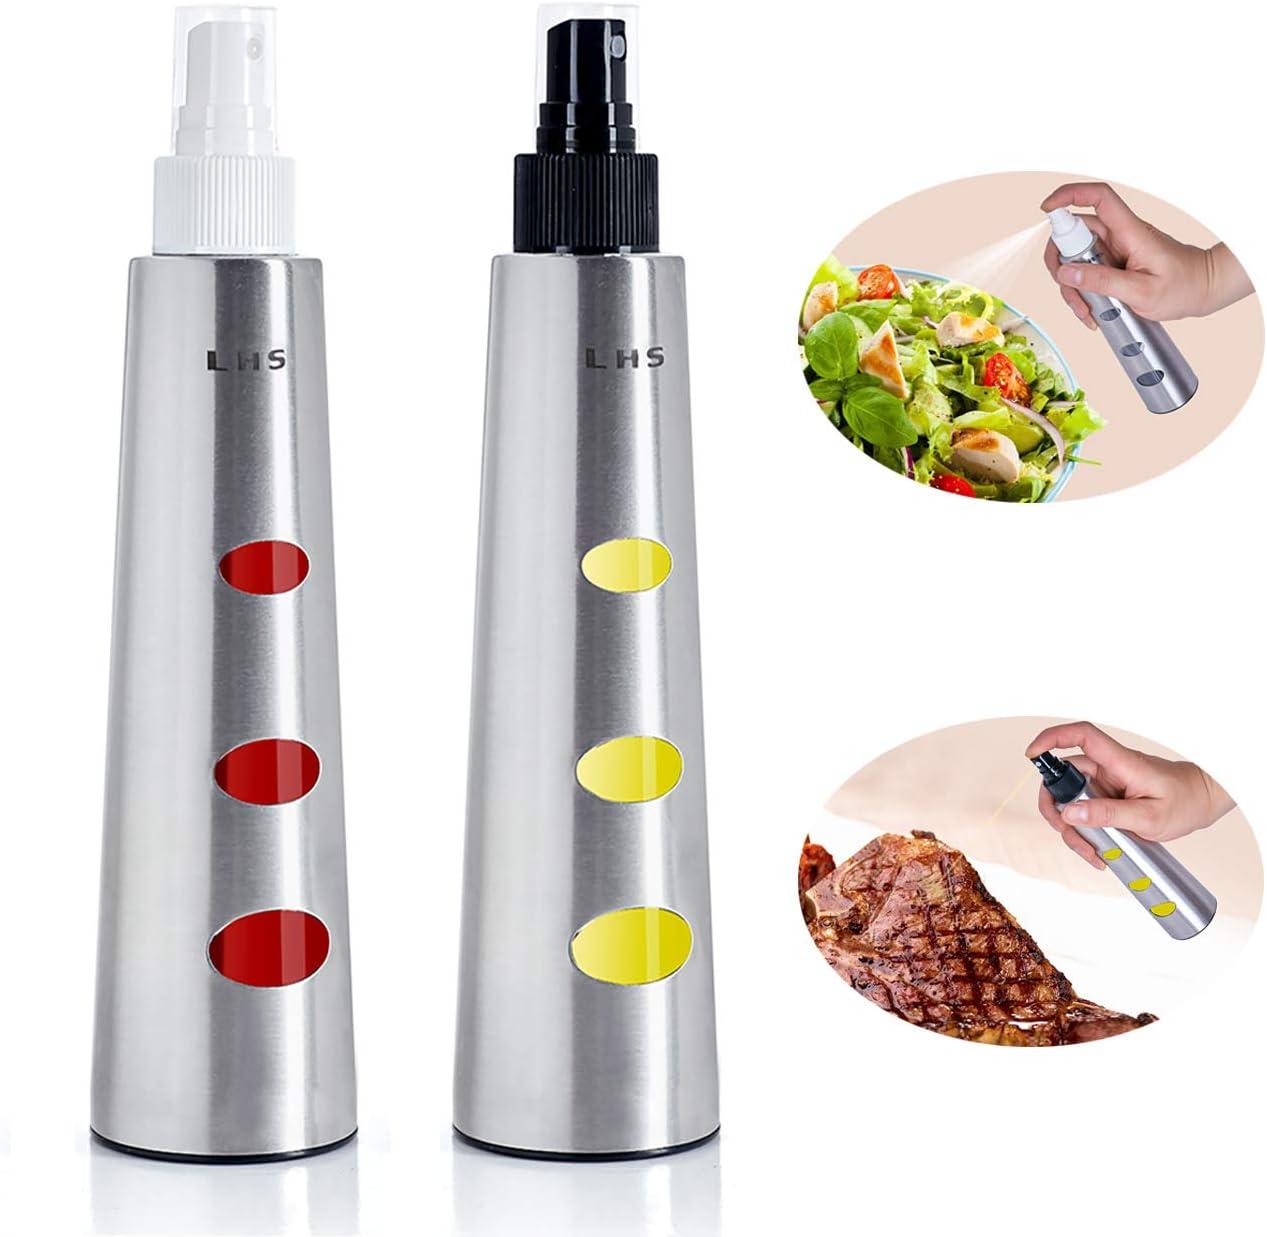 LHS Olive Oil Sprayer Mister Dispenser Stainless Steel Bottle 200 ml Set of 2 Perfect for BBQ Grilling and Roasting Cooking Wine Vinegar Sprayer